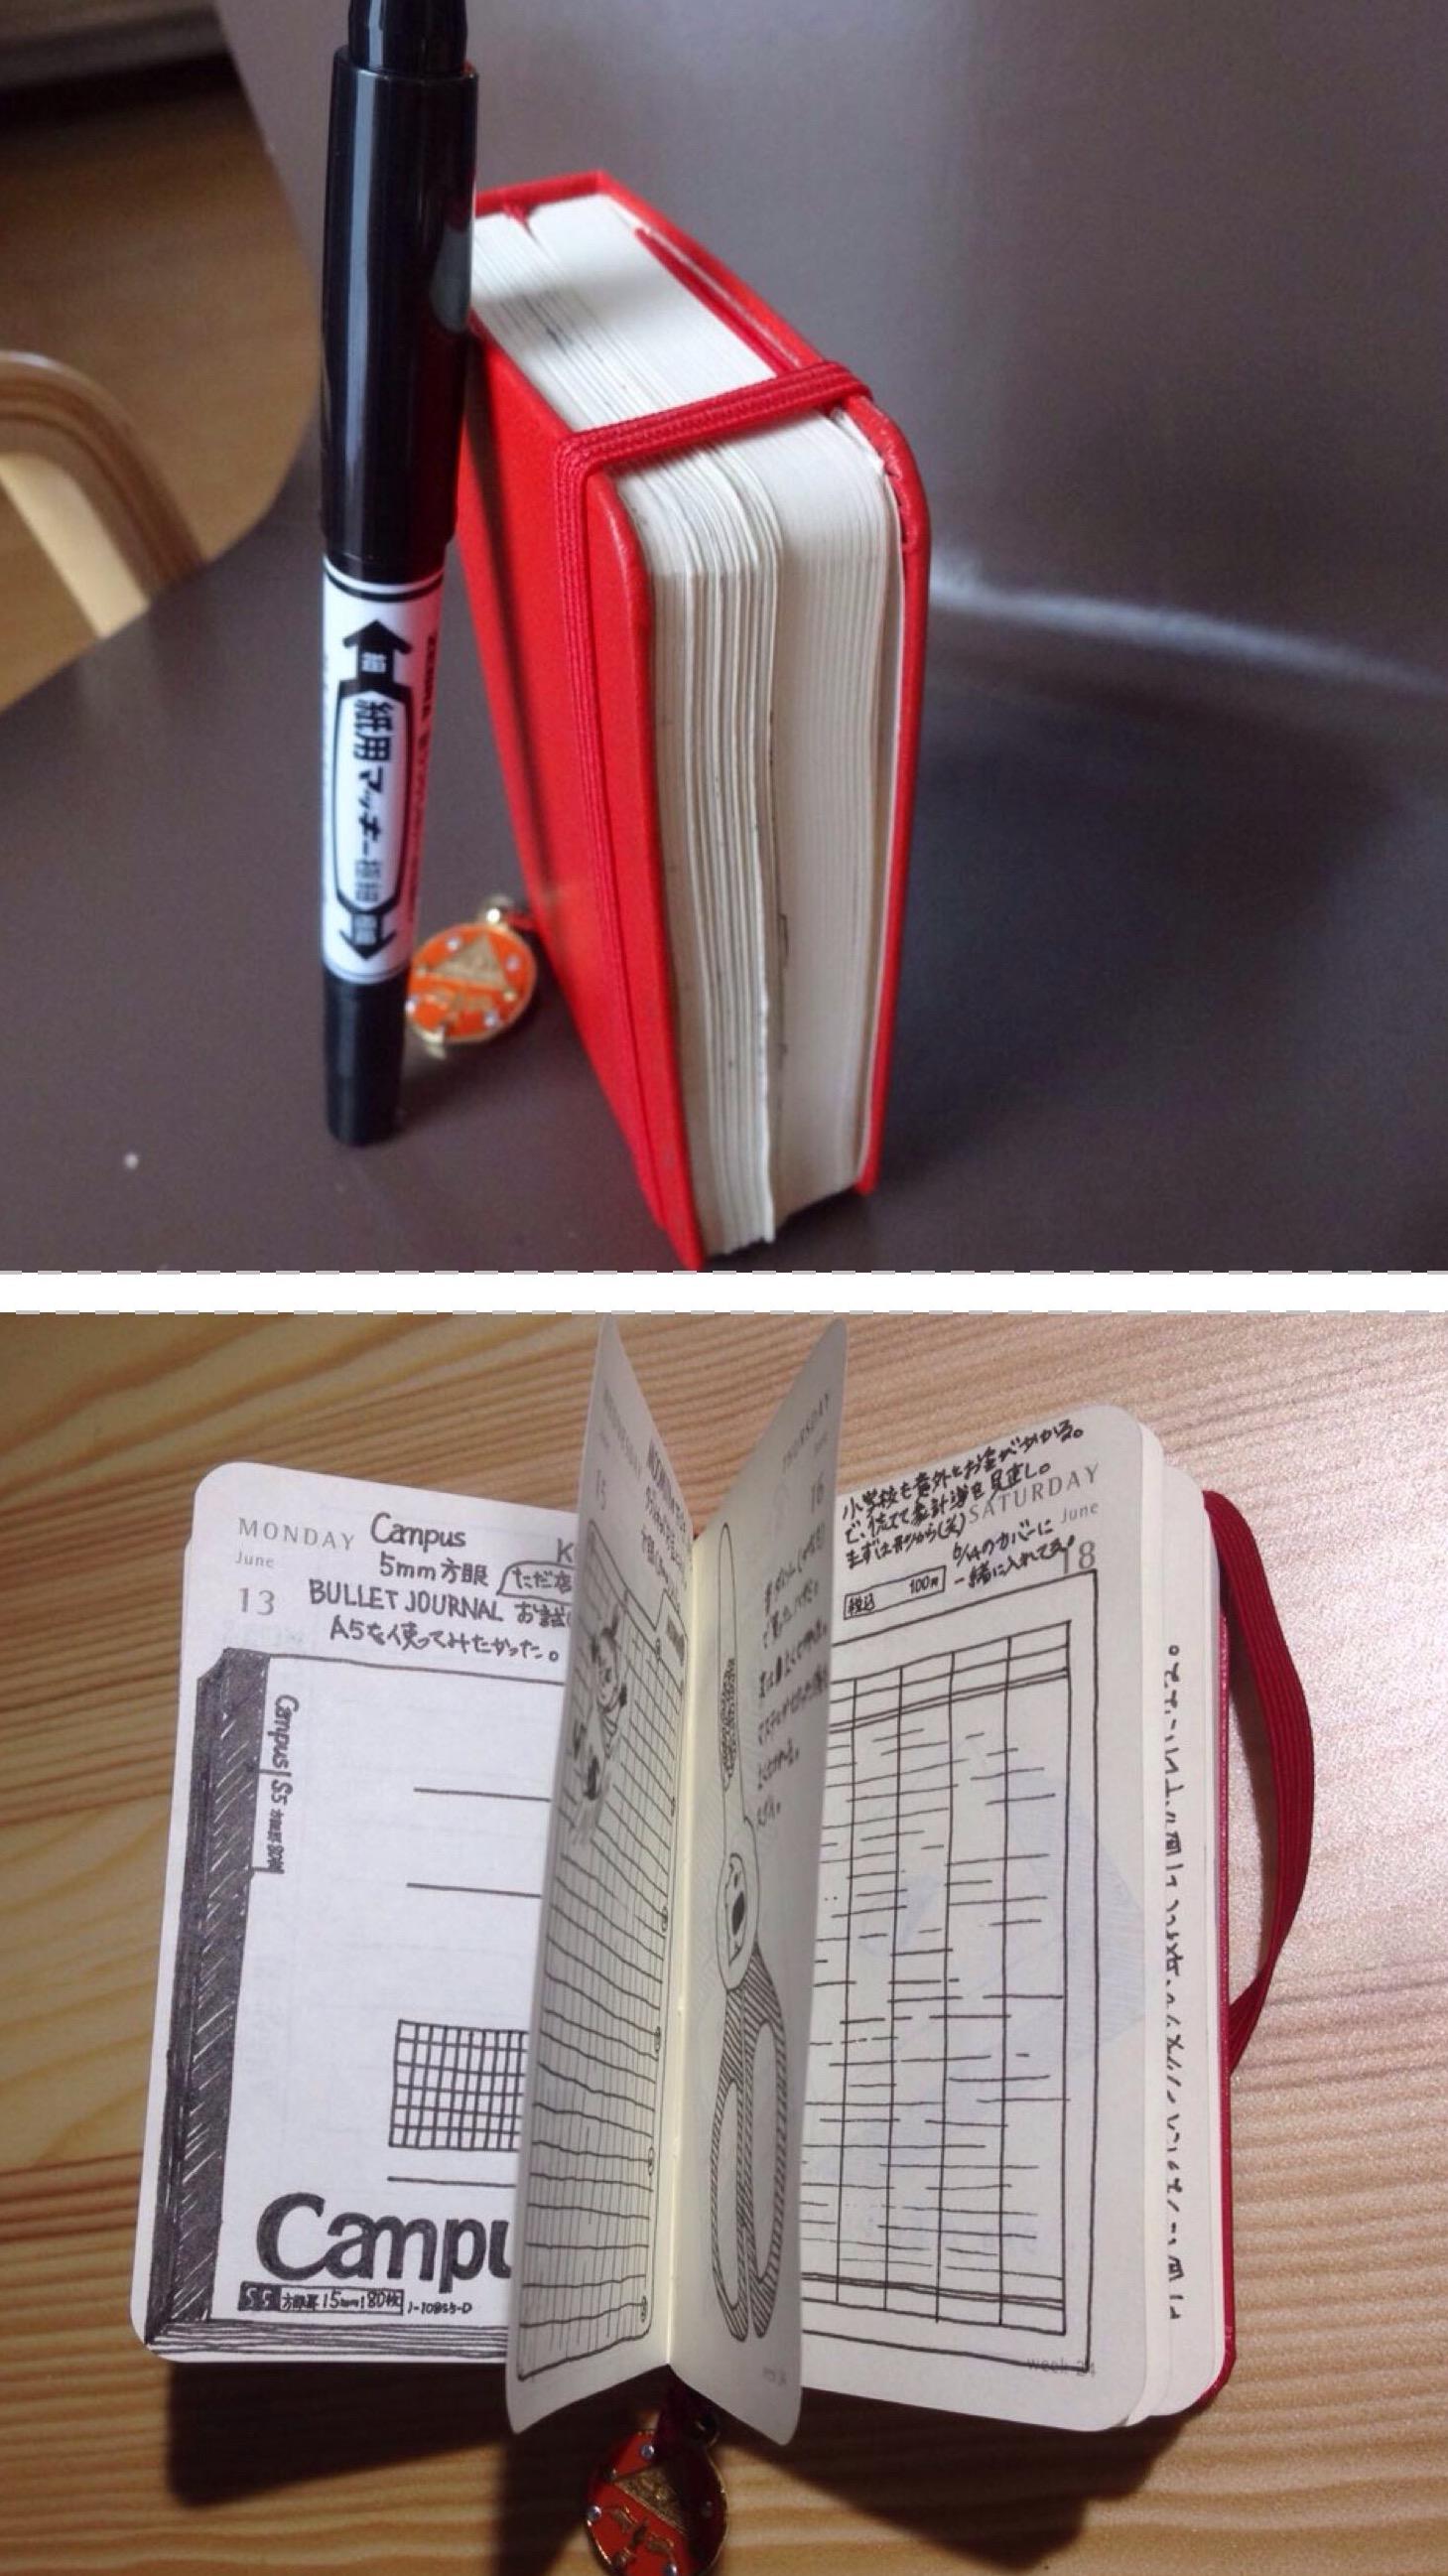 Item notebook